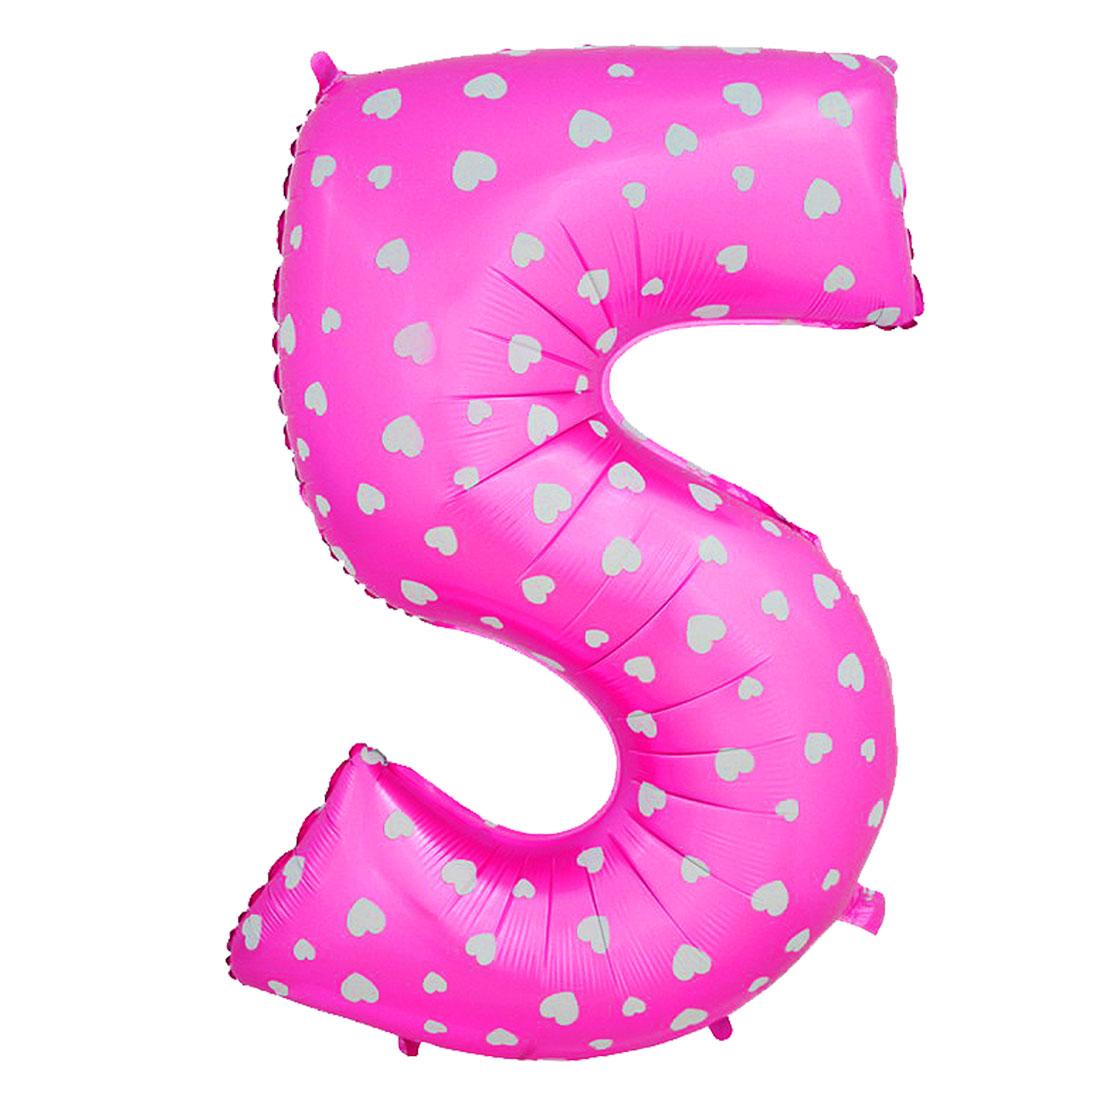 "Unique Bargains 16"" Fuchsia Foil Number 5 Shape Balloon Helium Birthday Wedding Decor"